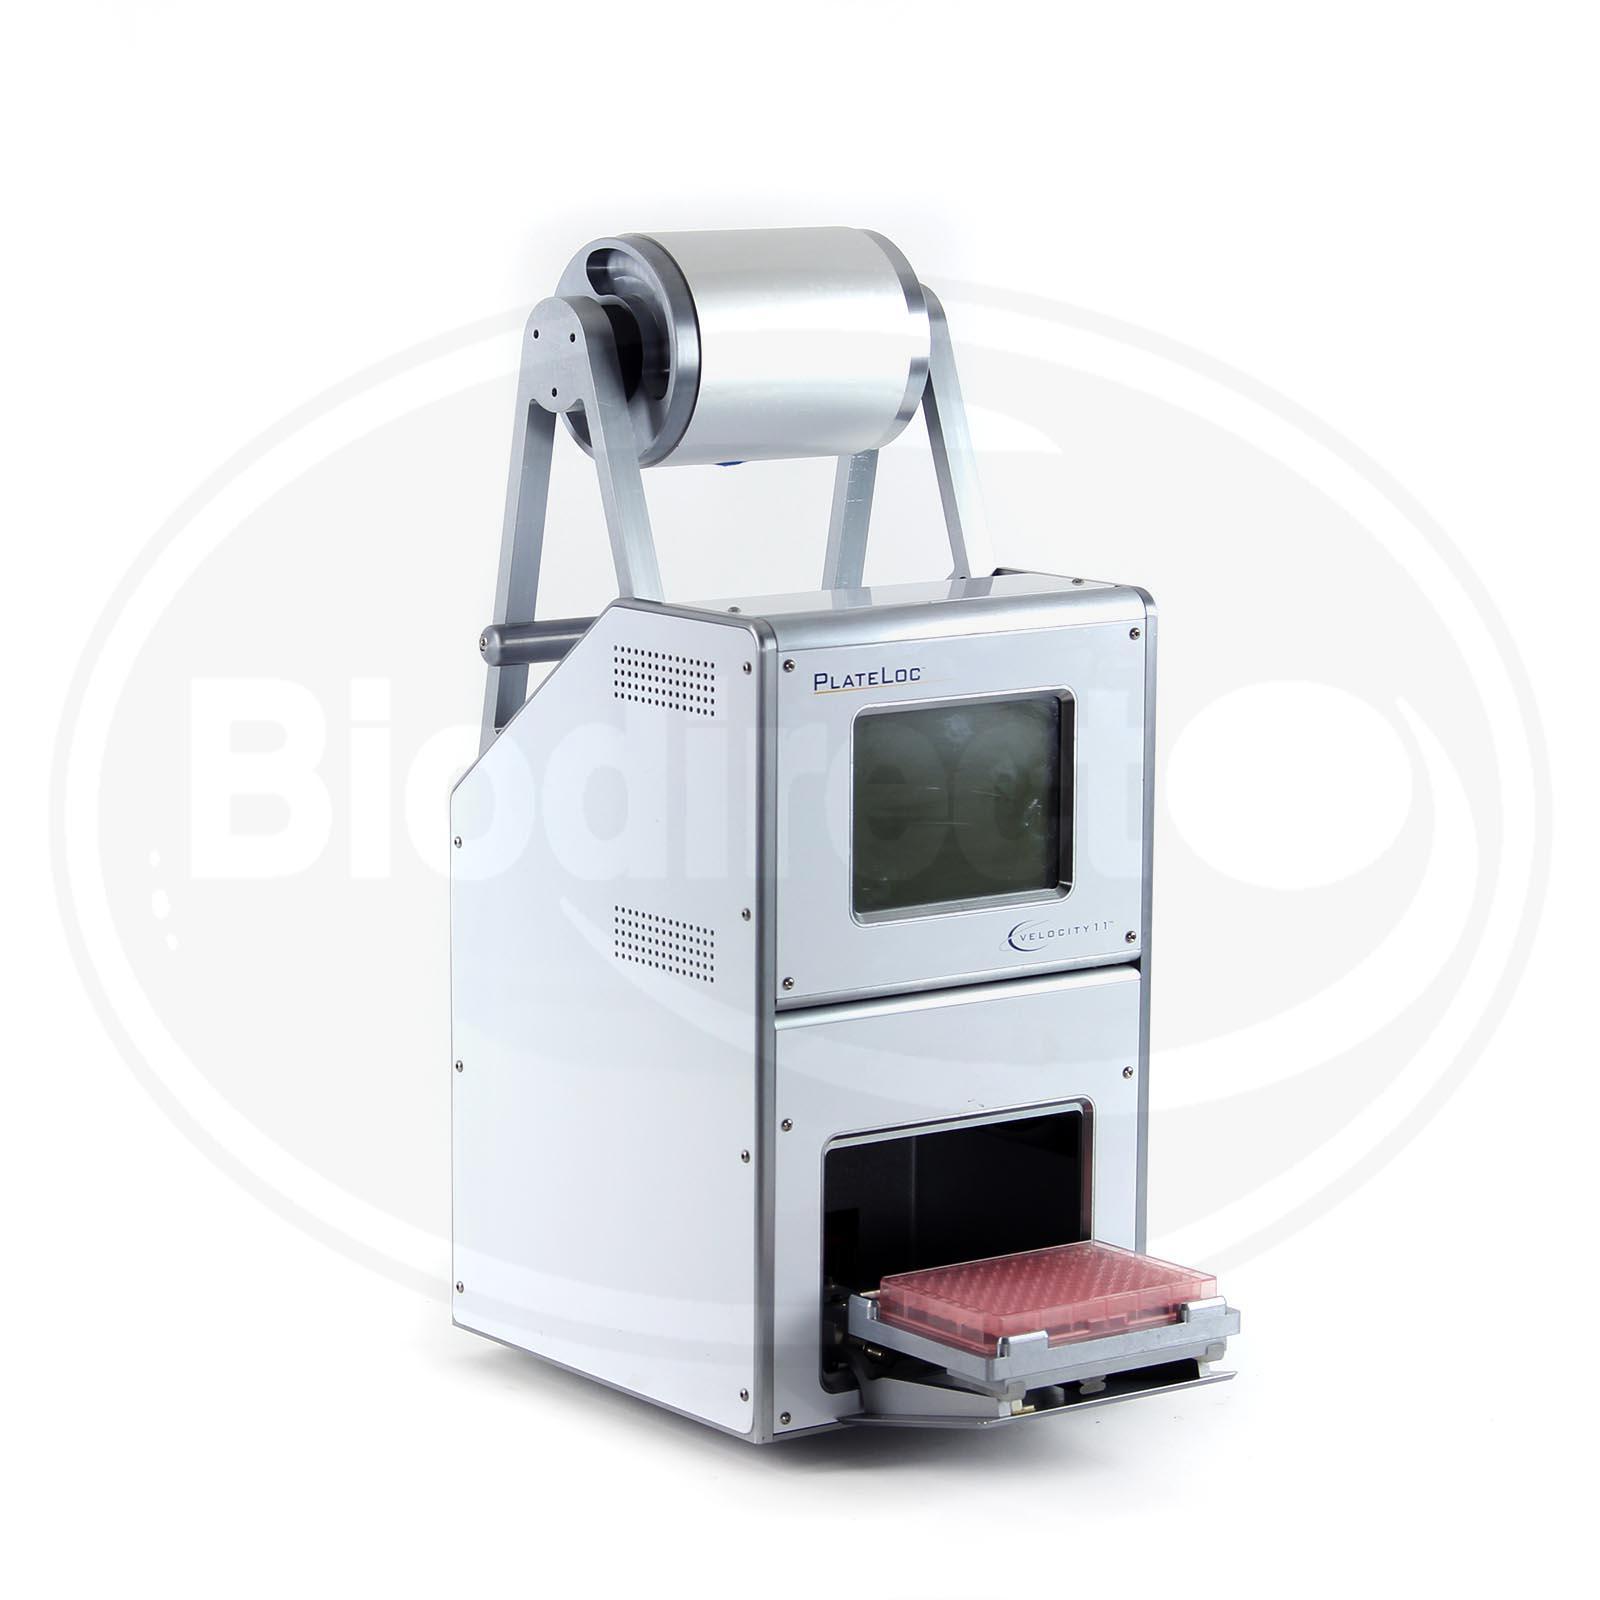 Agilent Velocity 11 PlateLoc Microplate Sealer:Heat